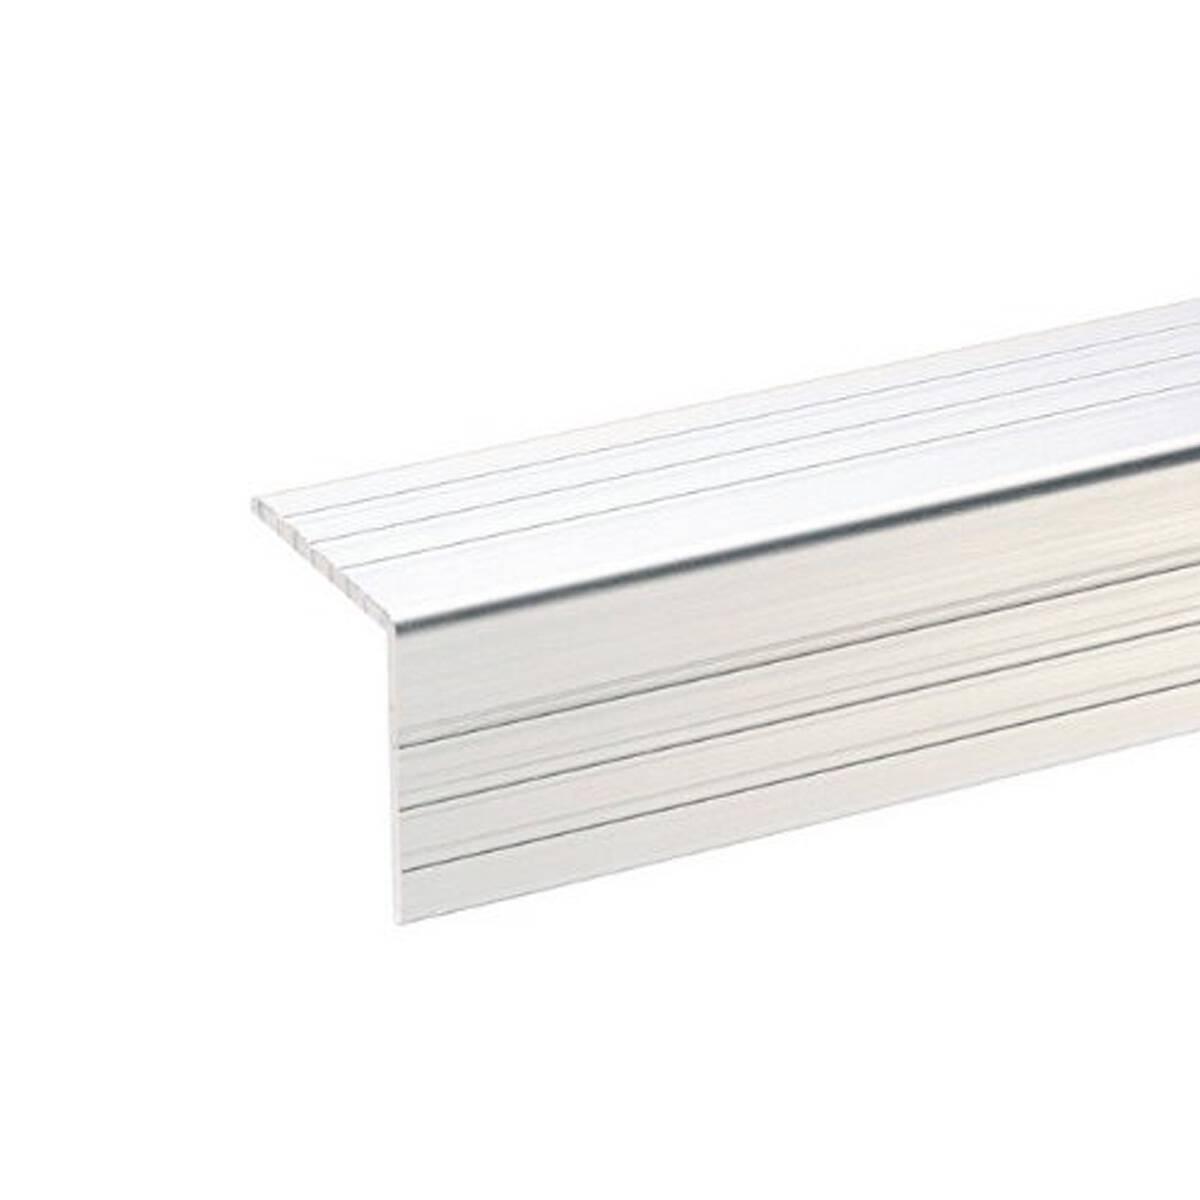 adam hall 6111 aluminium kantenschutz 35x35 mm casebau. Black Bedroom Furniture Sets. Home Design Ideas